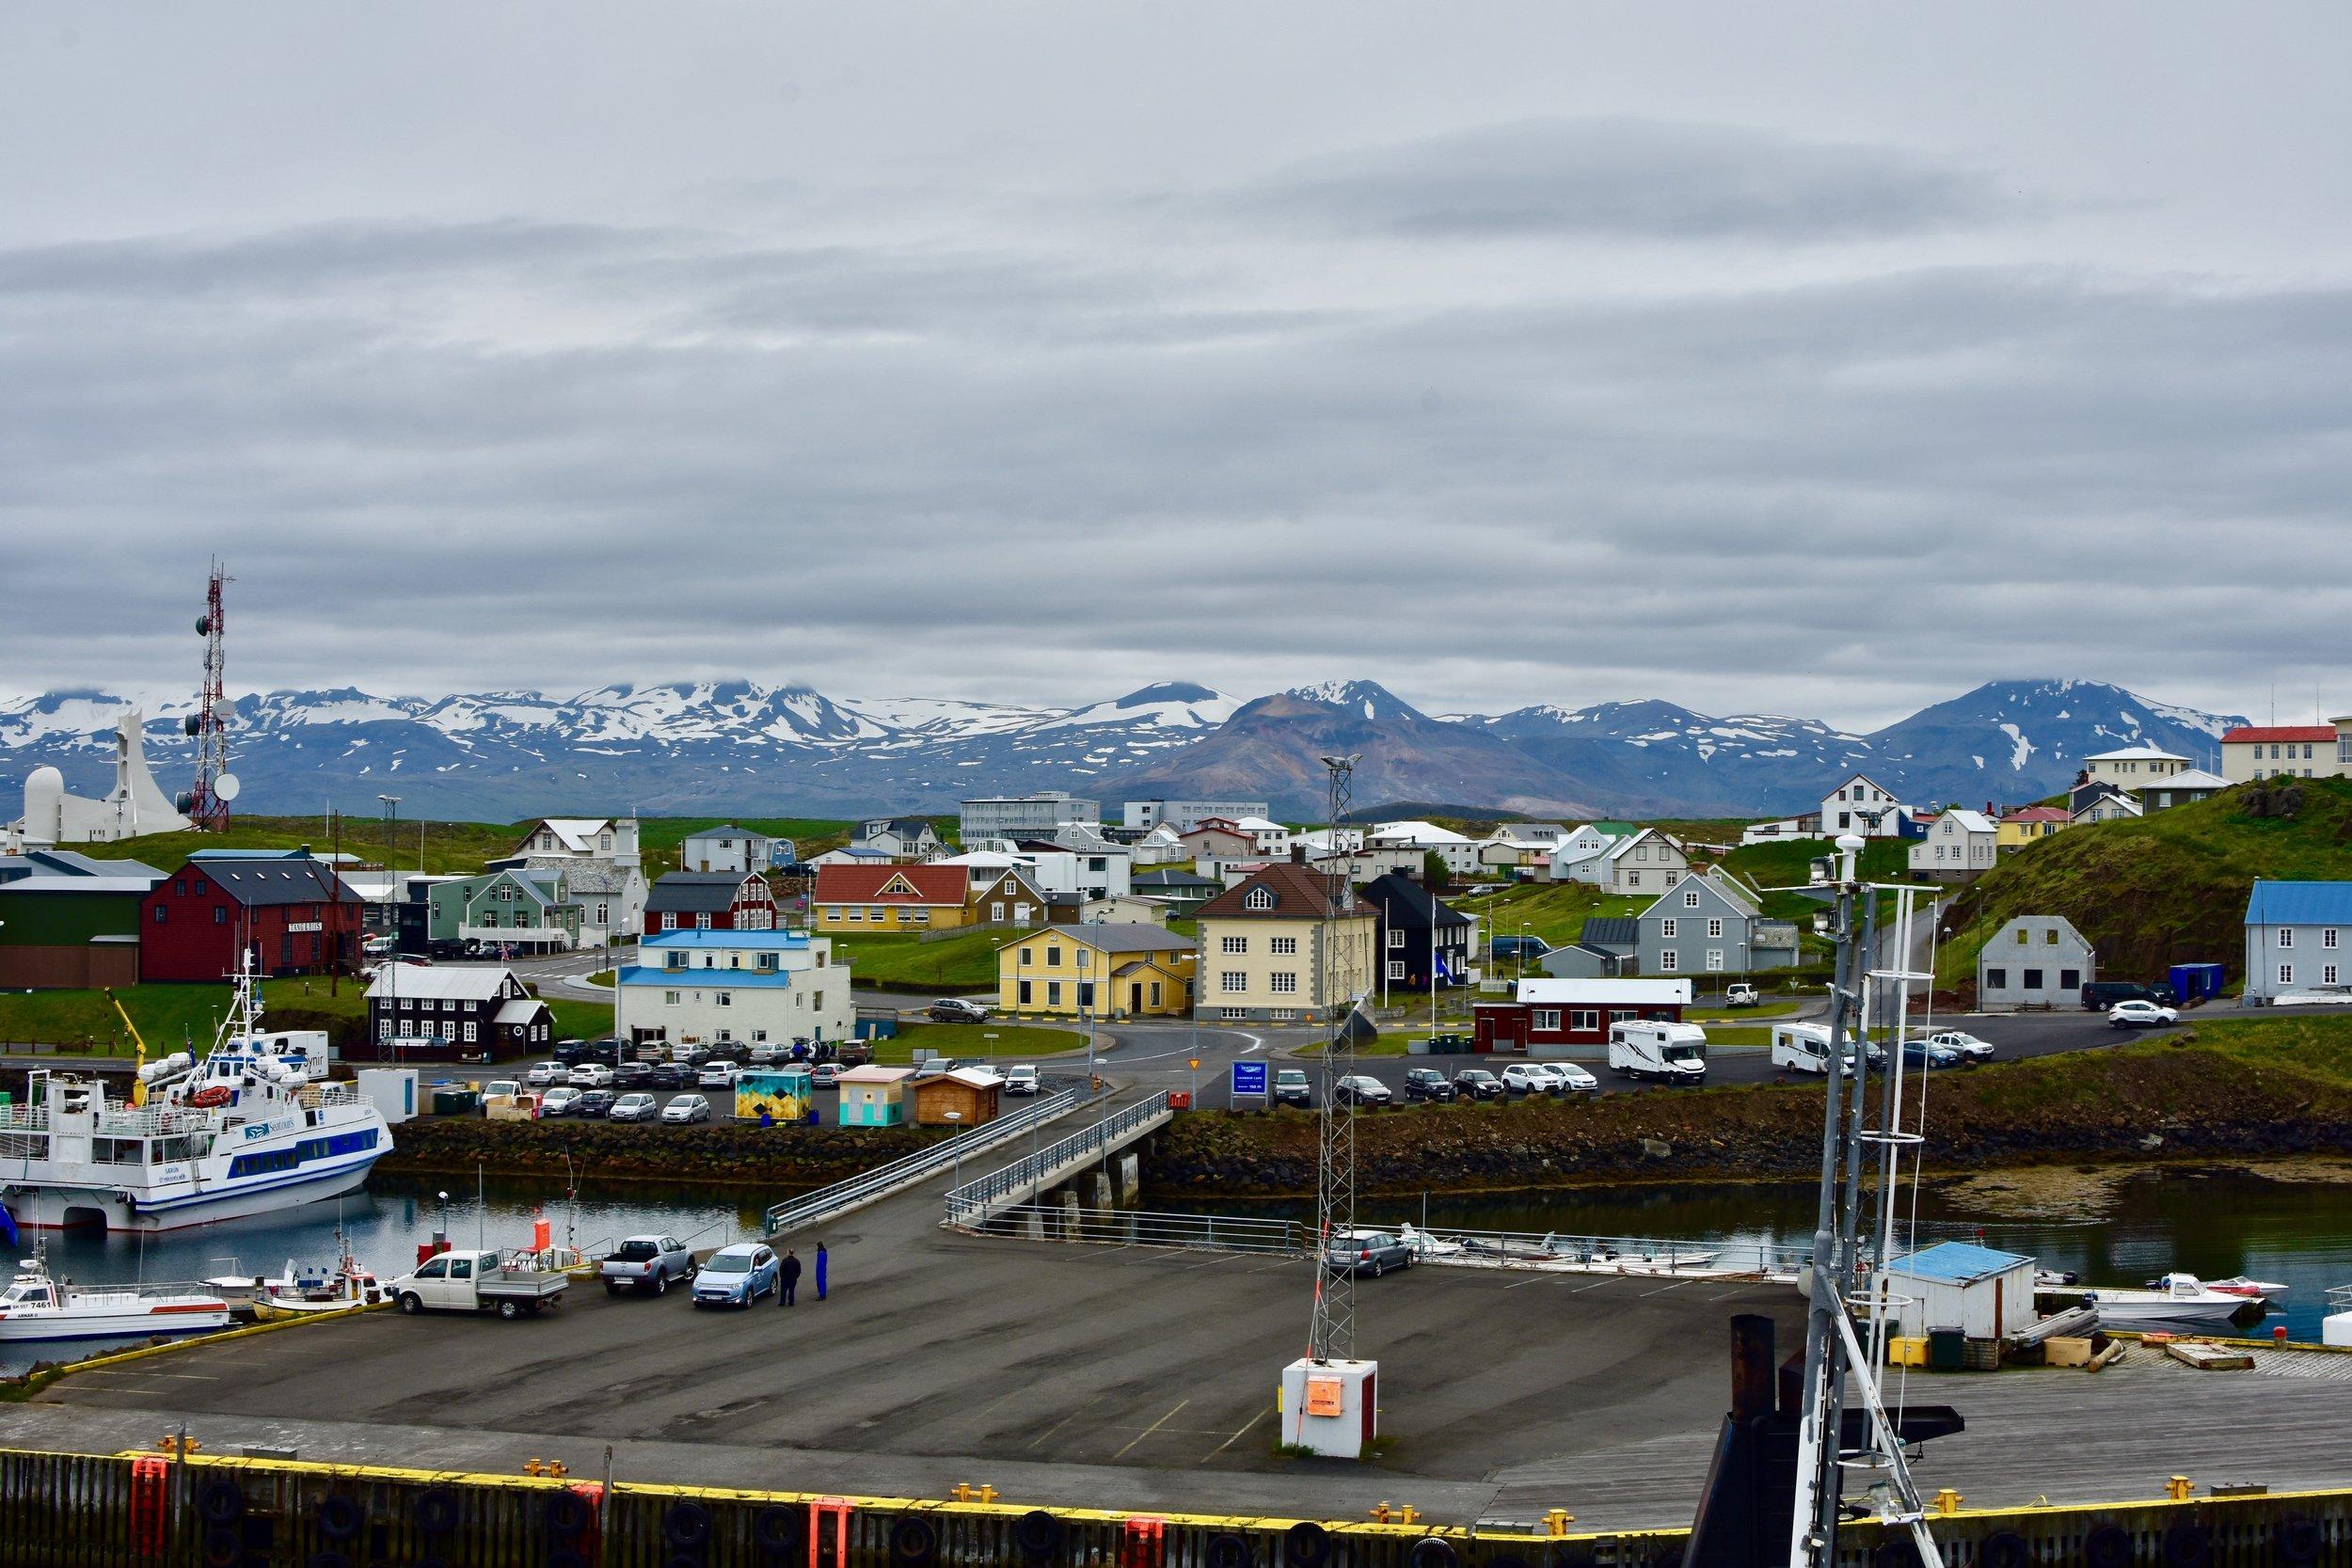 STYKKISHÓLMUR Village in Snæfellsnes Peninsula, Iceland